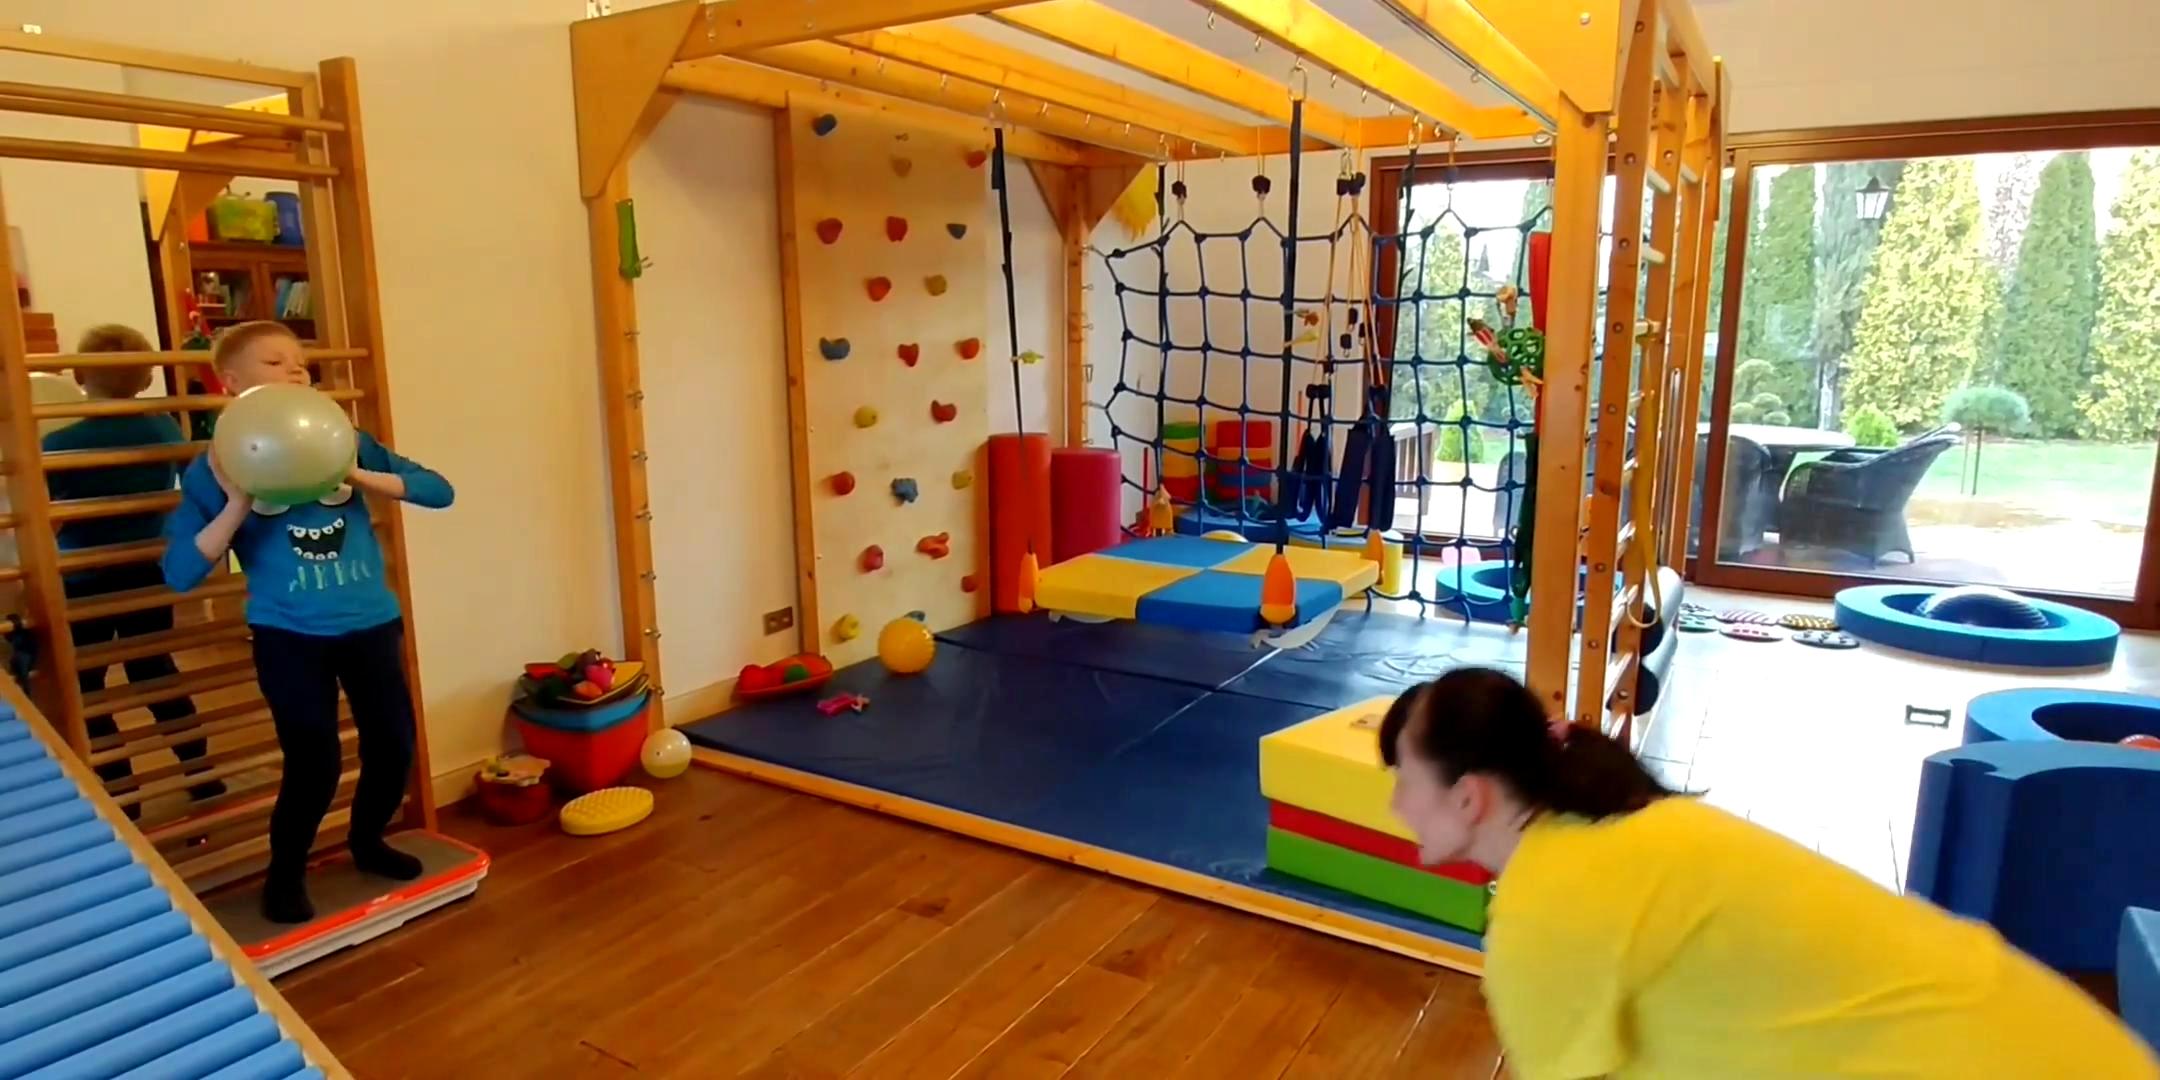 Terapia Rehabilitacja Dziecieca Z Pilkami Reaxing Reax Fluiball 26cm